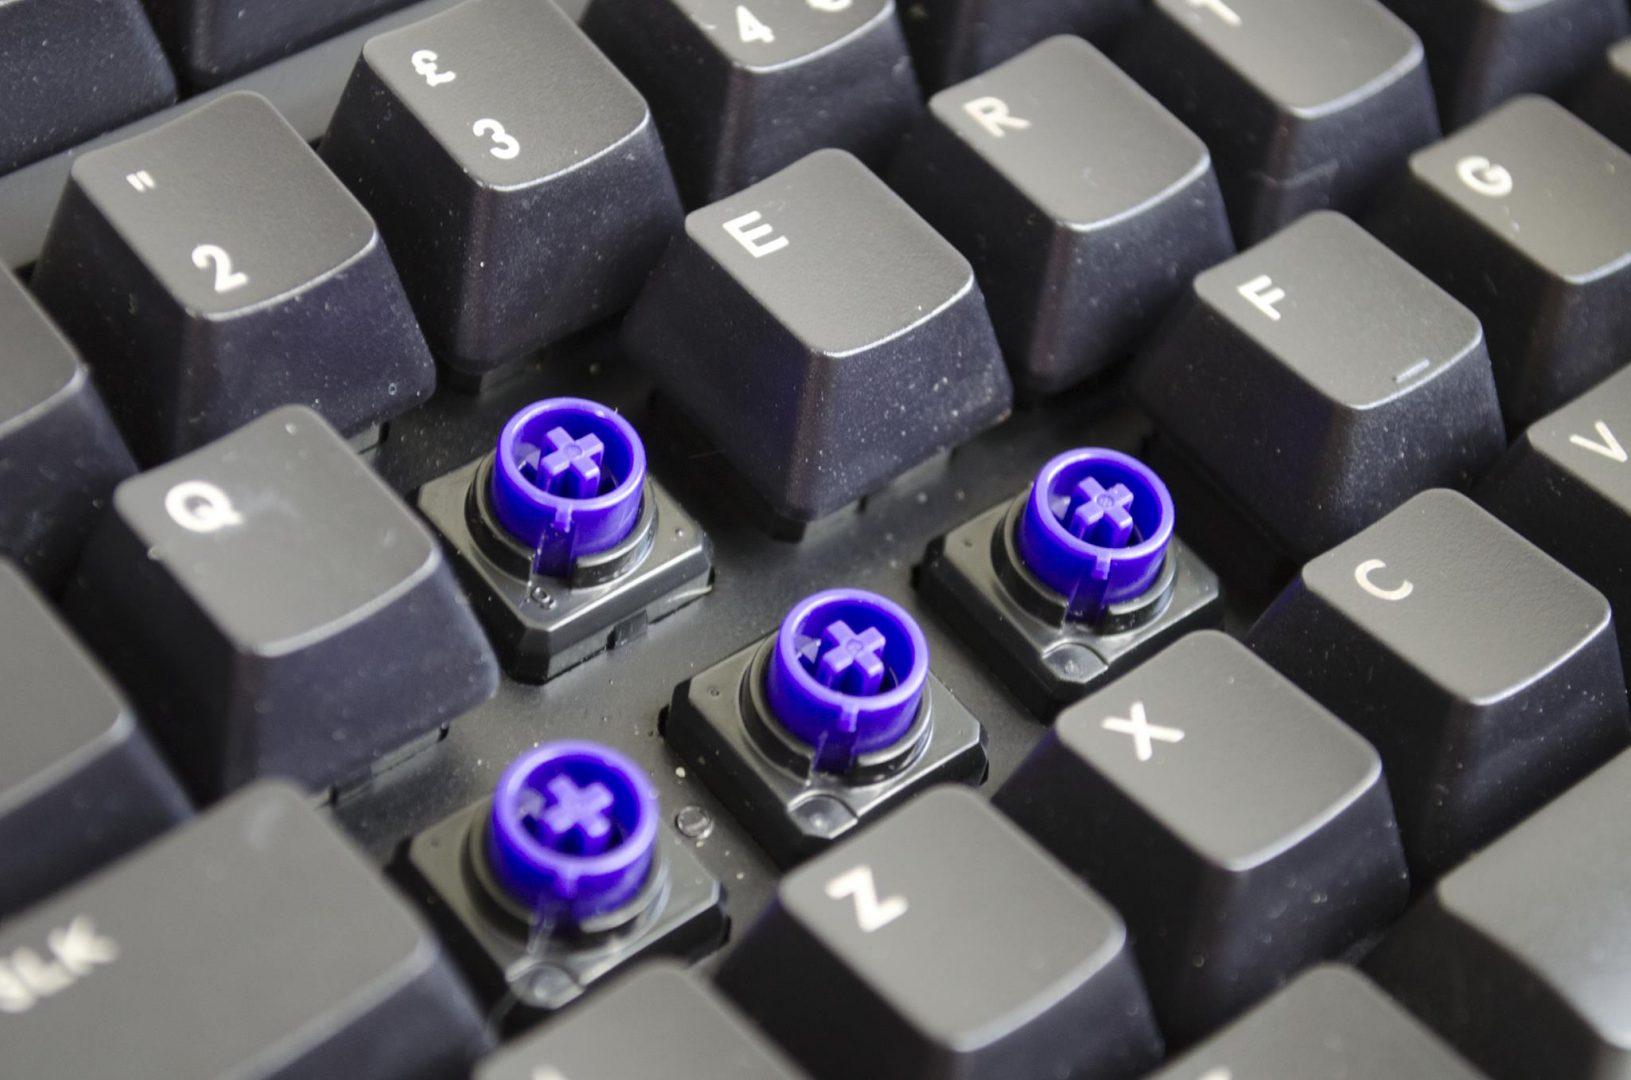 CMSTORM NovaTouch TKL Hybrid Capacitive Switch Keyboard Review_9